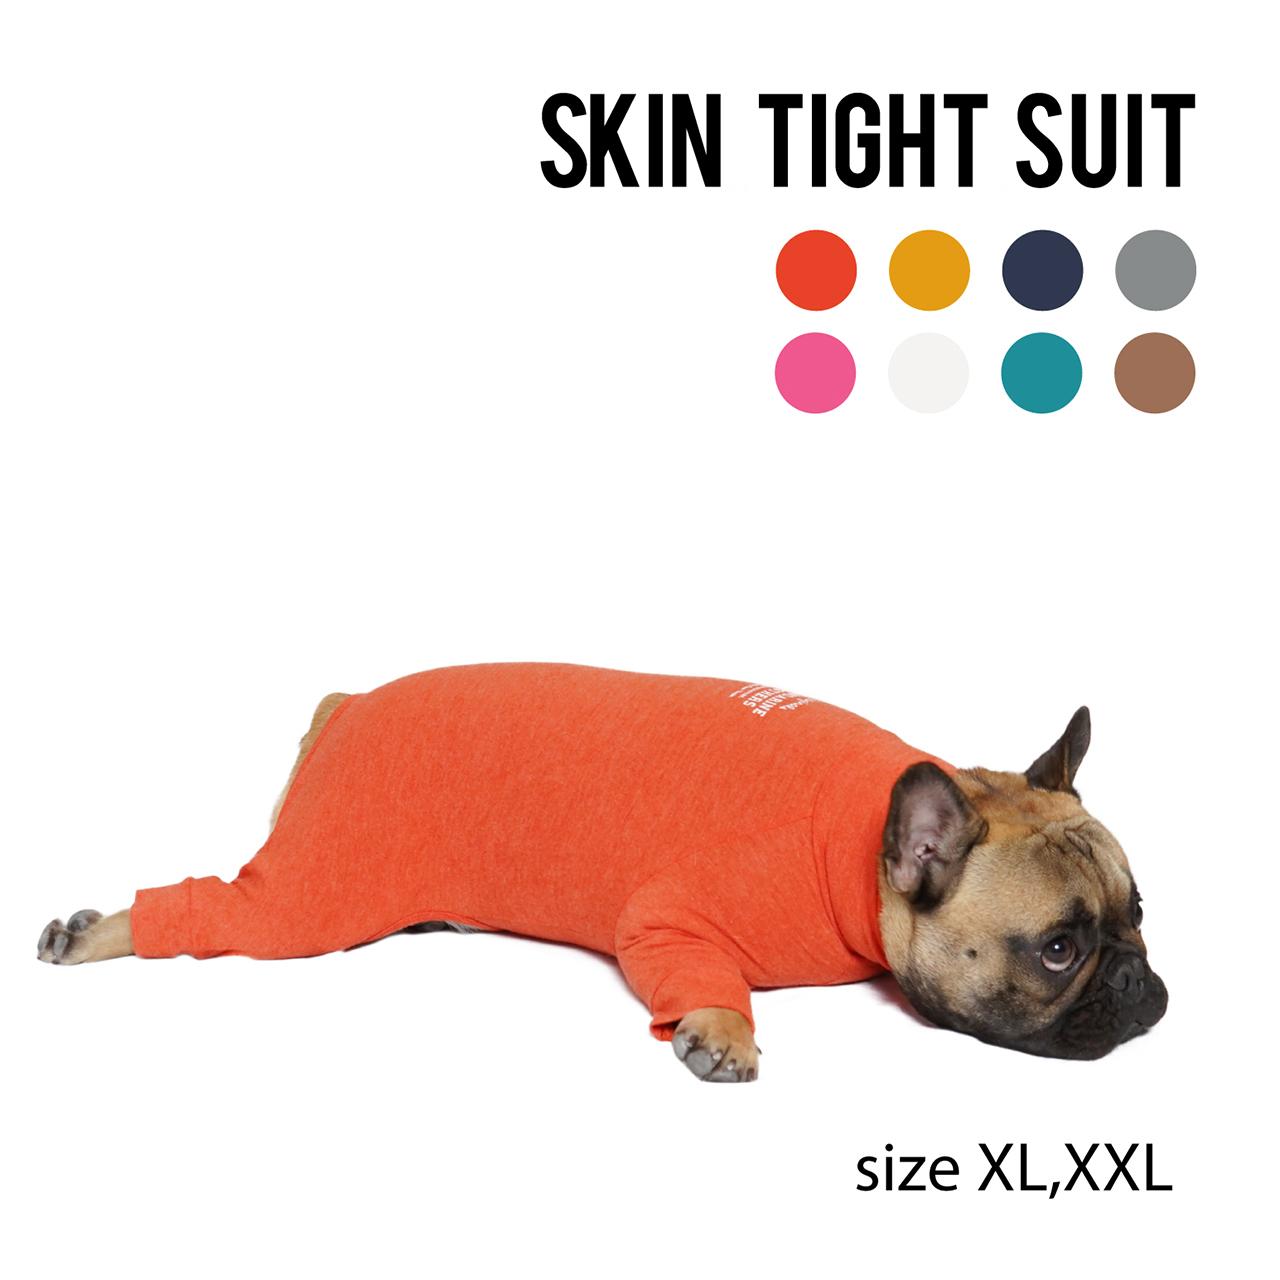 SKIN TIGHT SUITS(LD,XL,XXL)スキンタイトスーツ